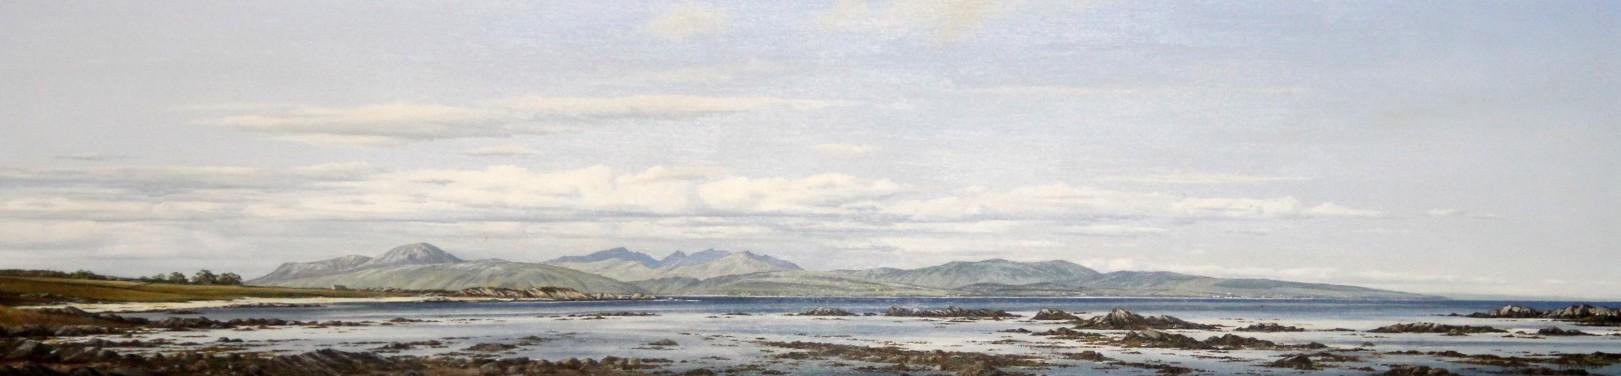 Ian Johnstone_Arran from Saddell Bay, Kintyre_Oils_6.5x28